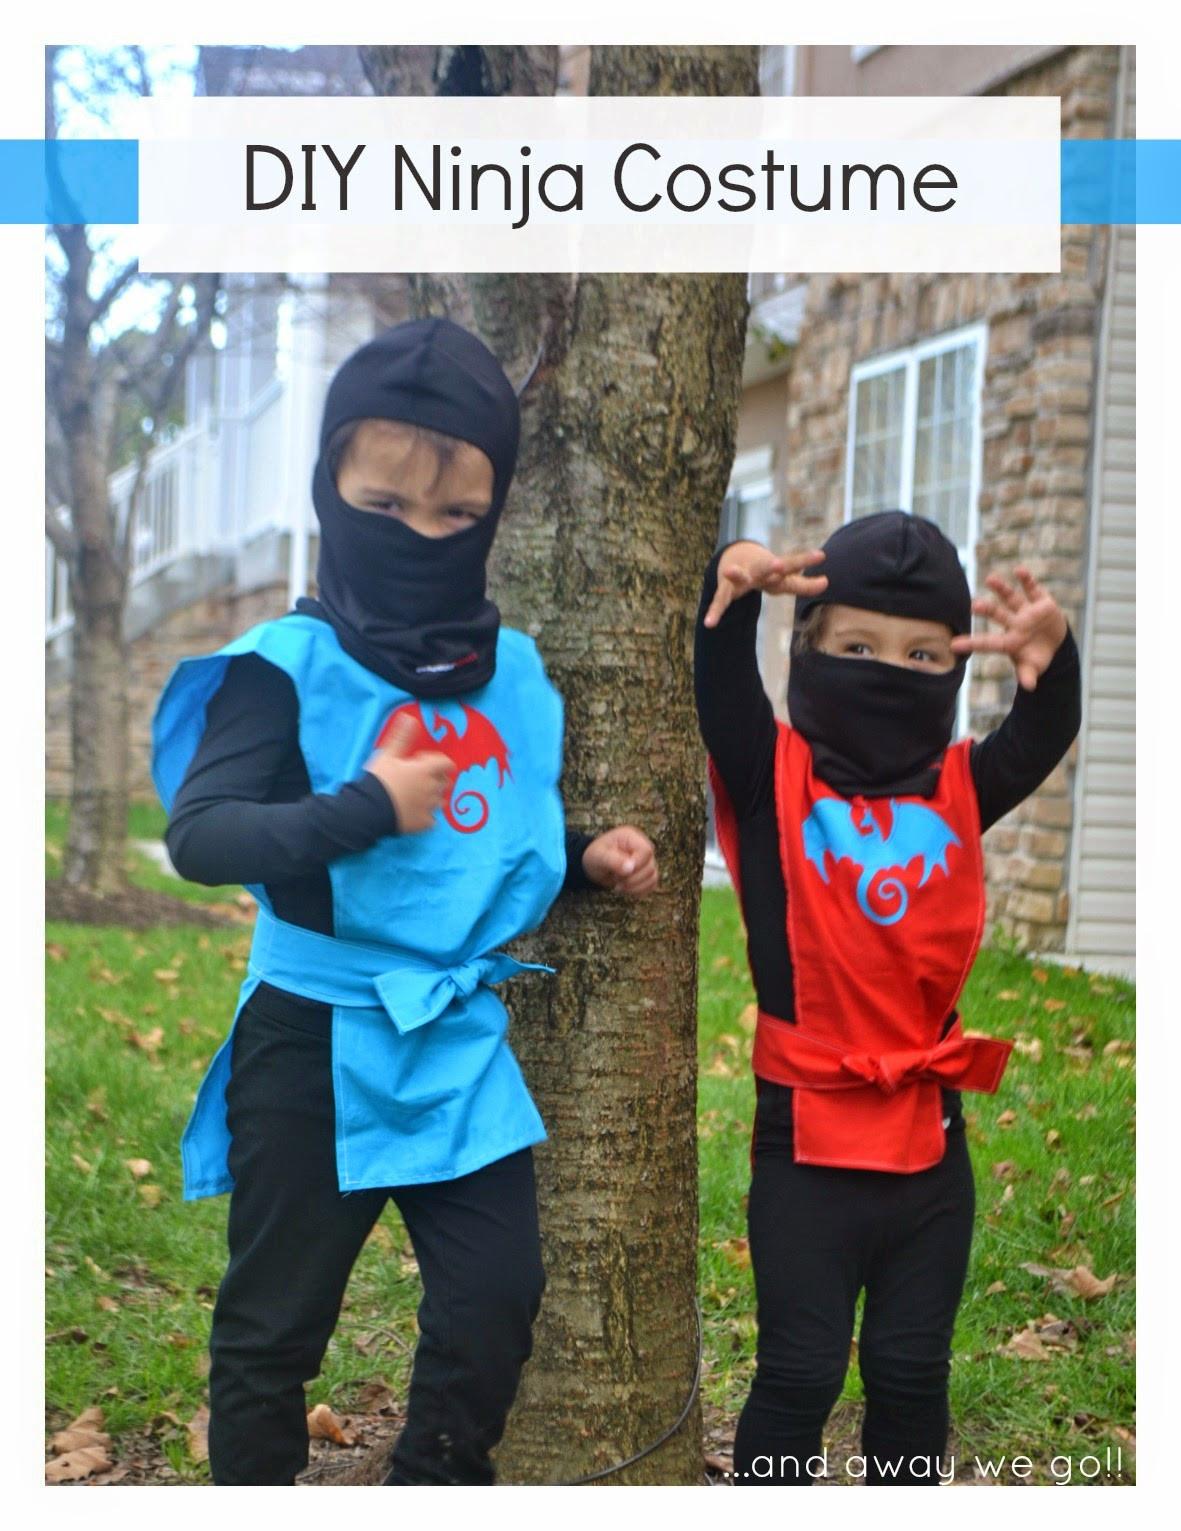 DIY Ninja Mask  and away we go DIY Ninja Costumes